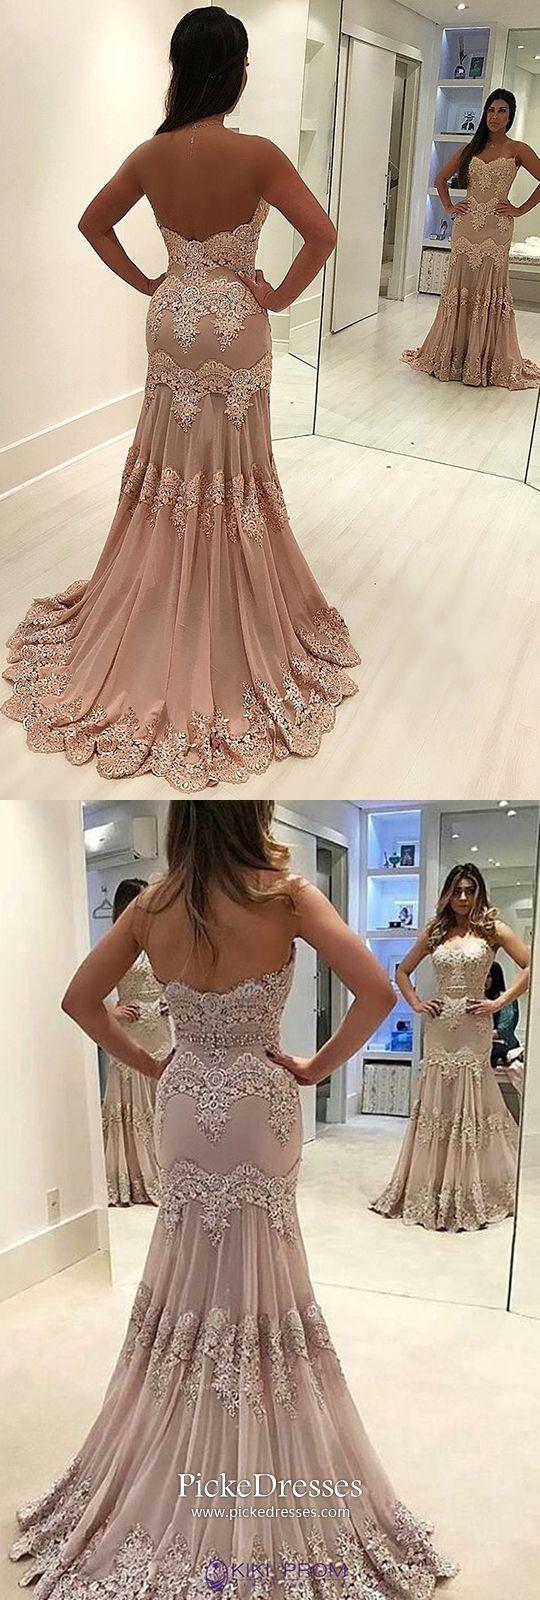 Mermaid prom dresses pink long formal dresses for teenagers